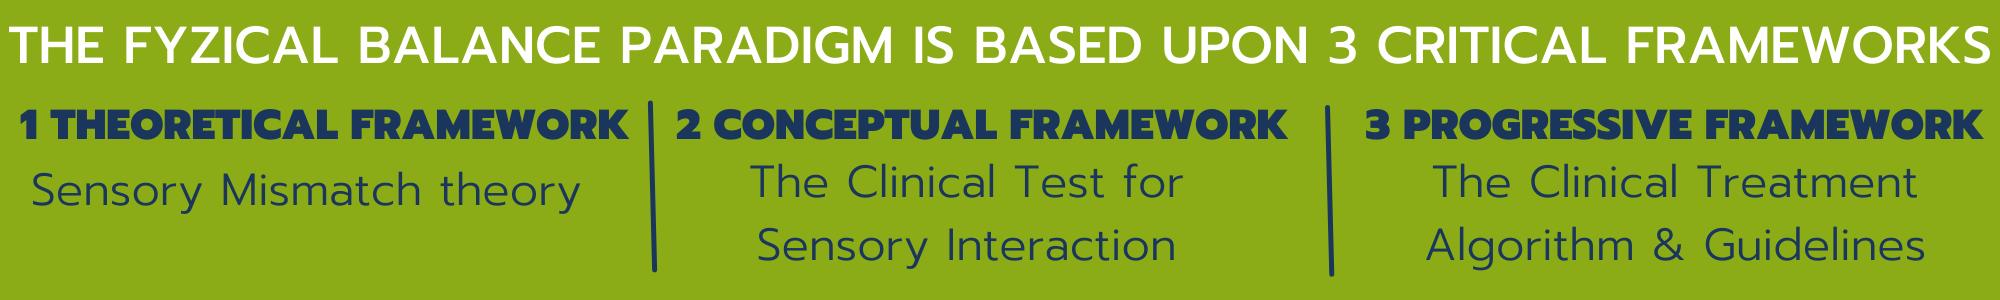 The FYZICAL Balance Paradigm is based on 3 critical frameworks